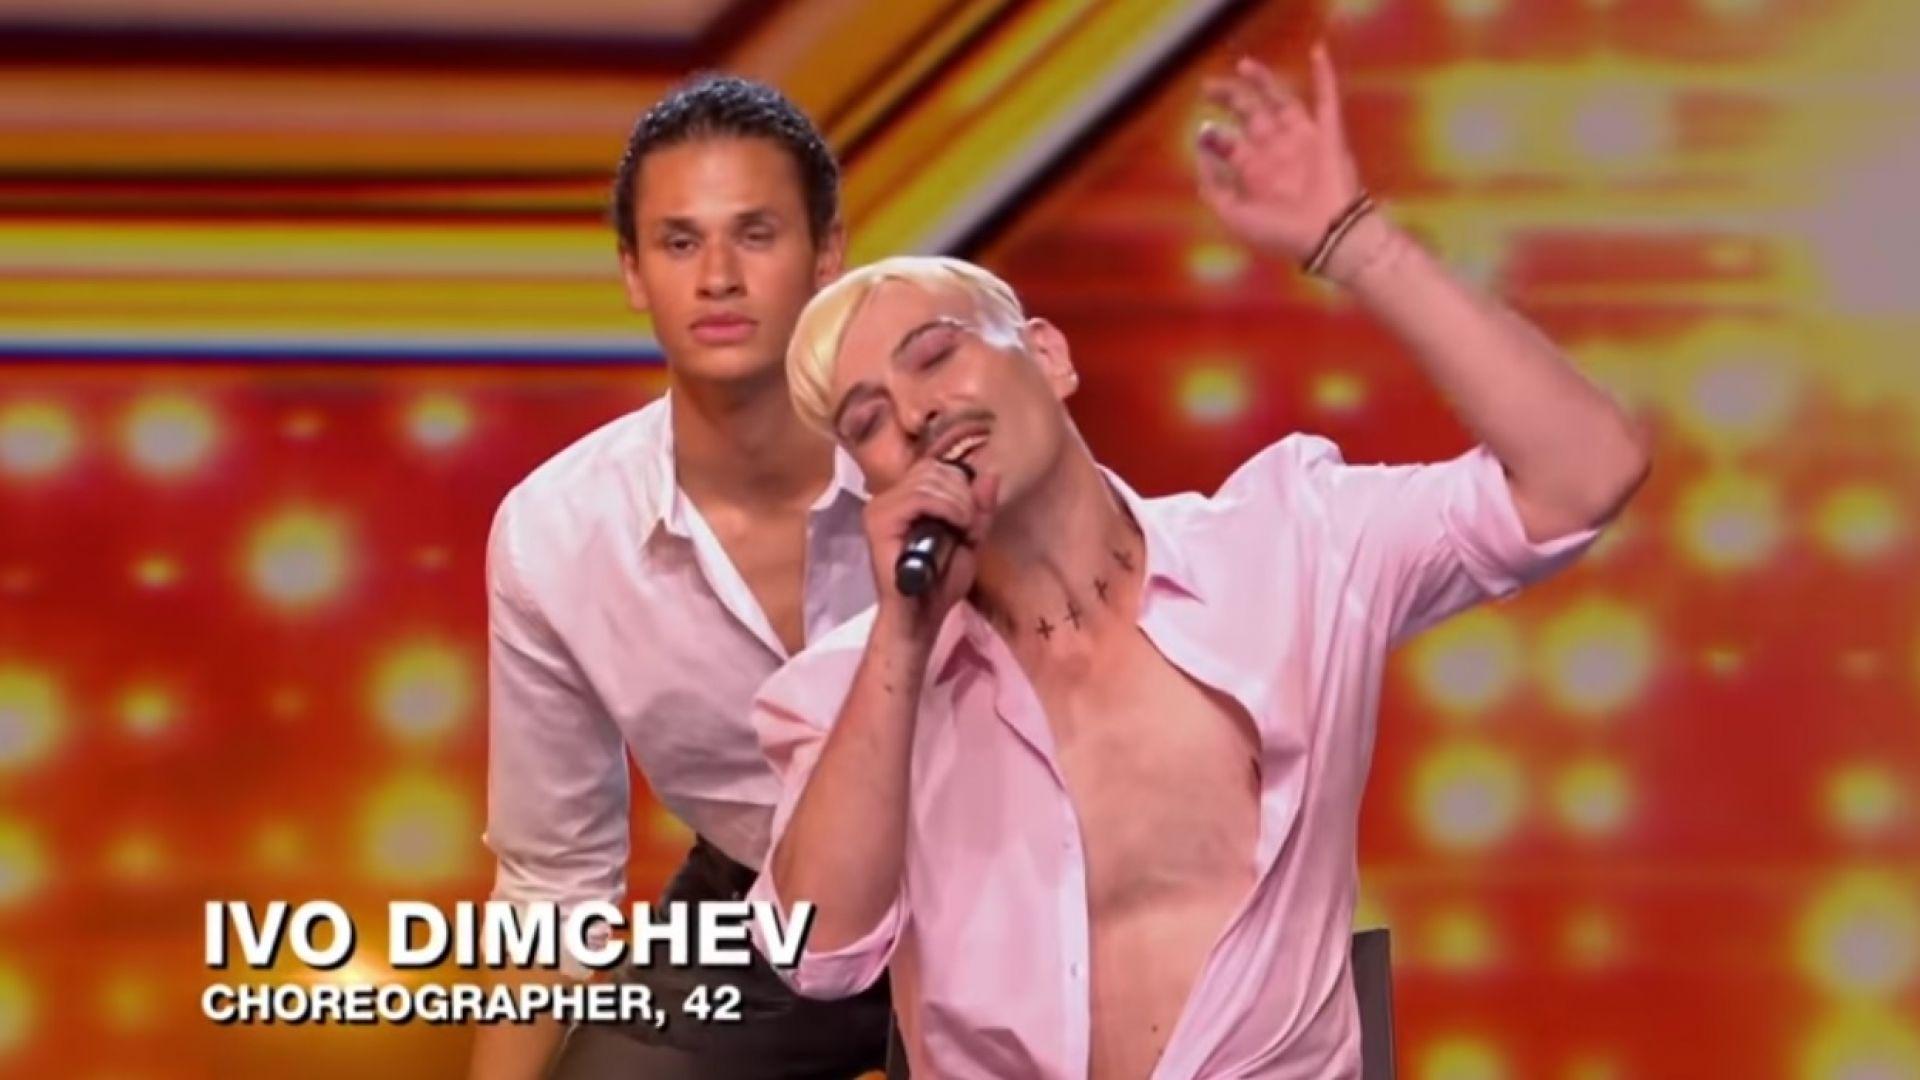 Скандалният Иво Димчев впечатли Роби Уилямс в британския X Factor